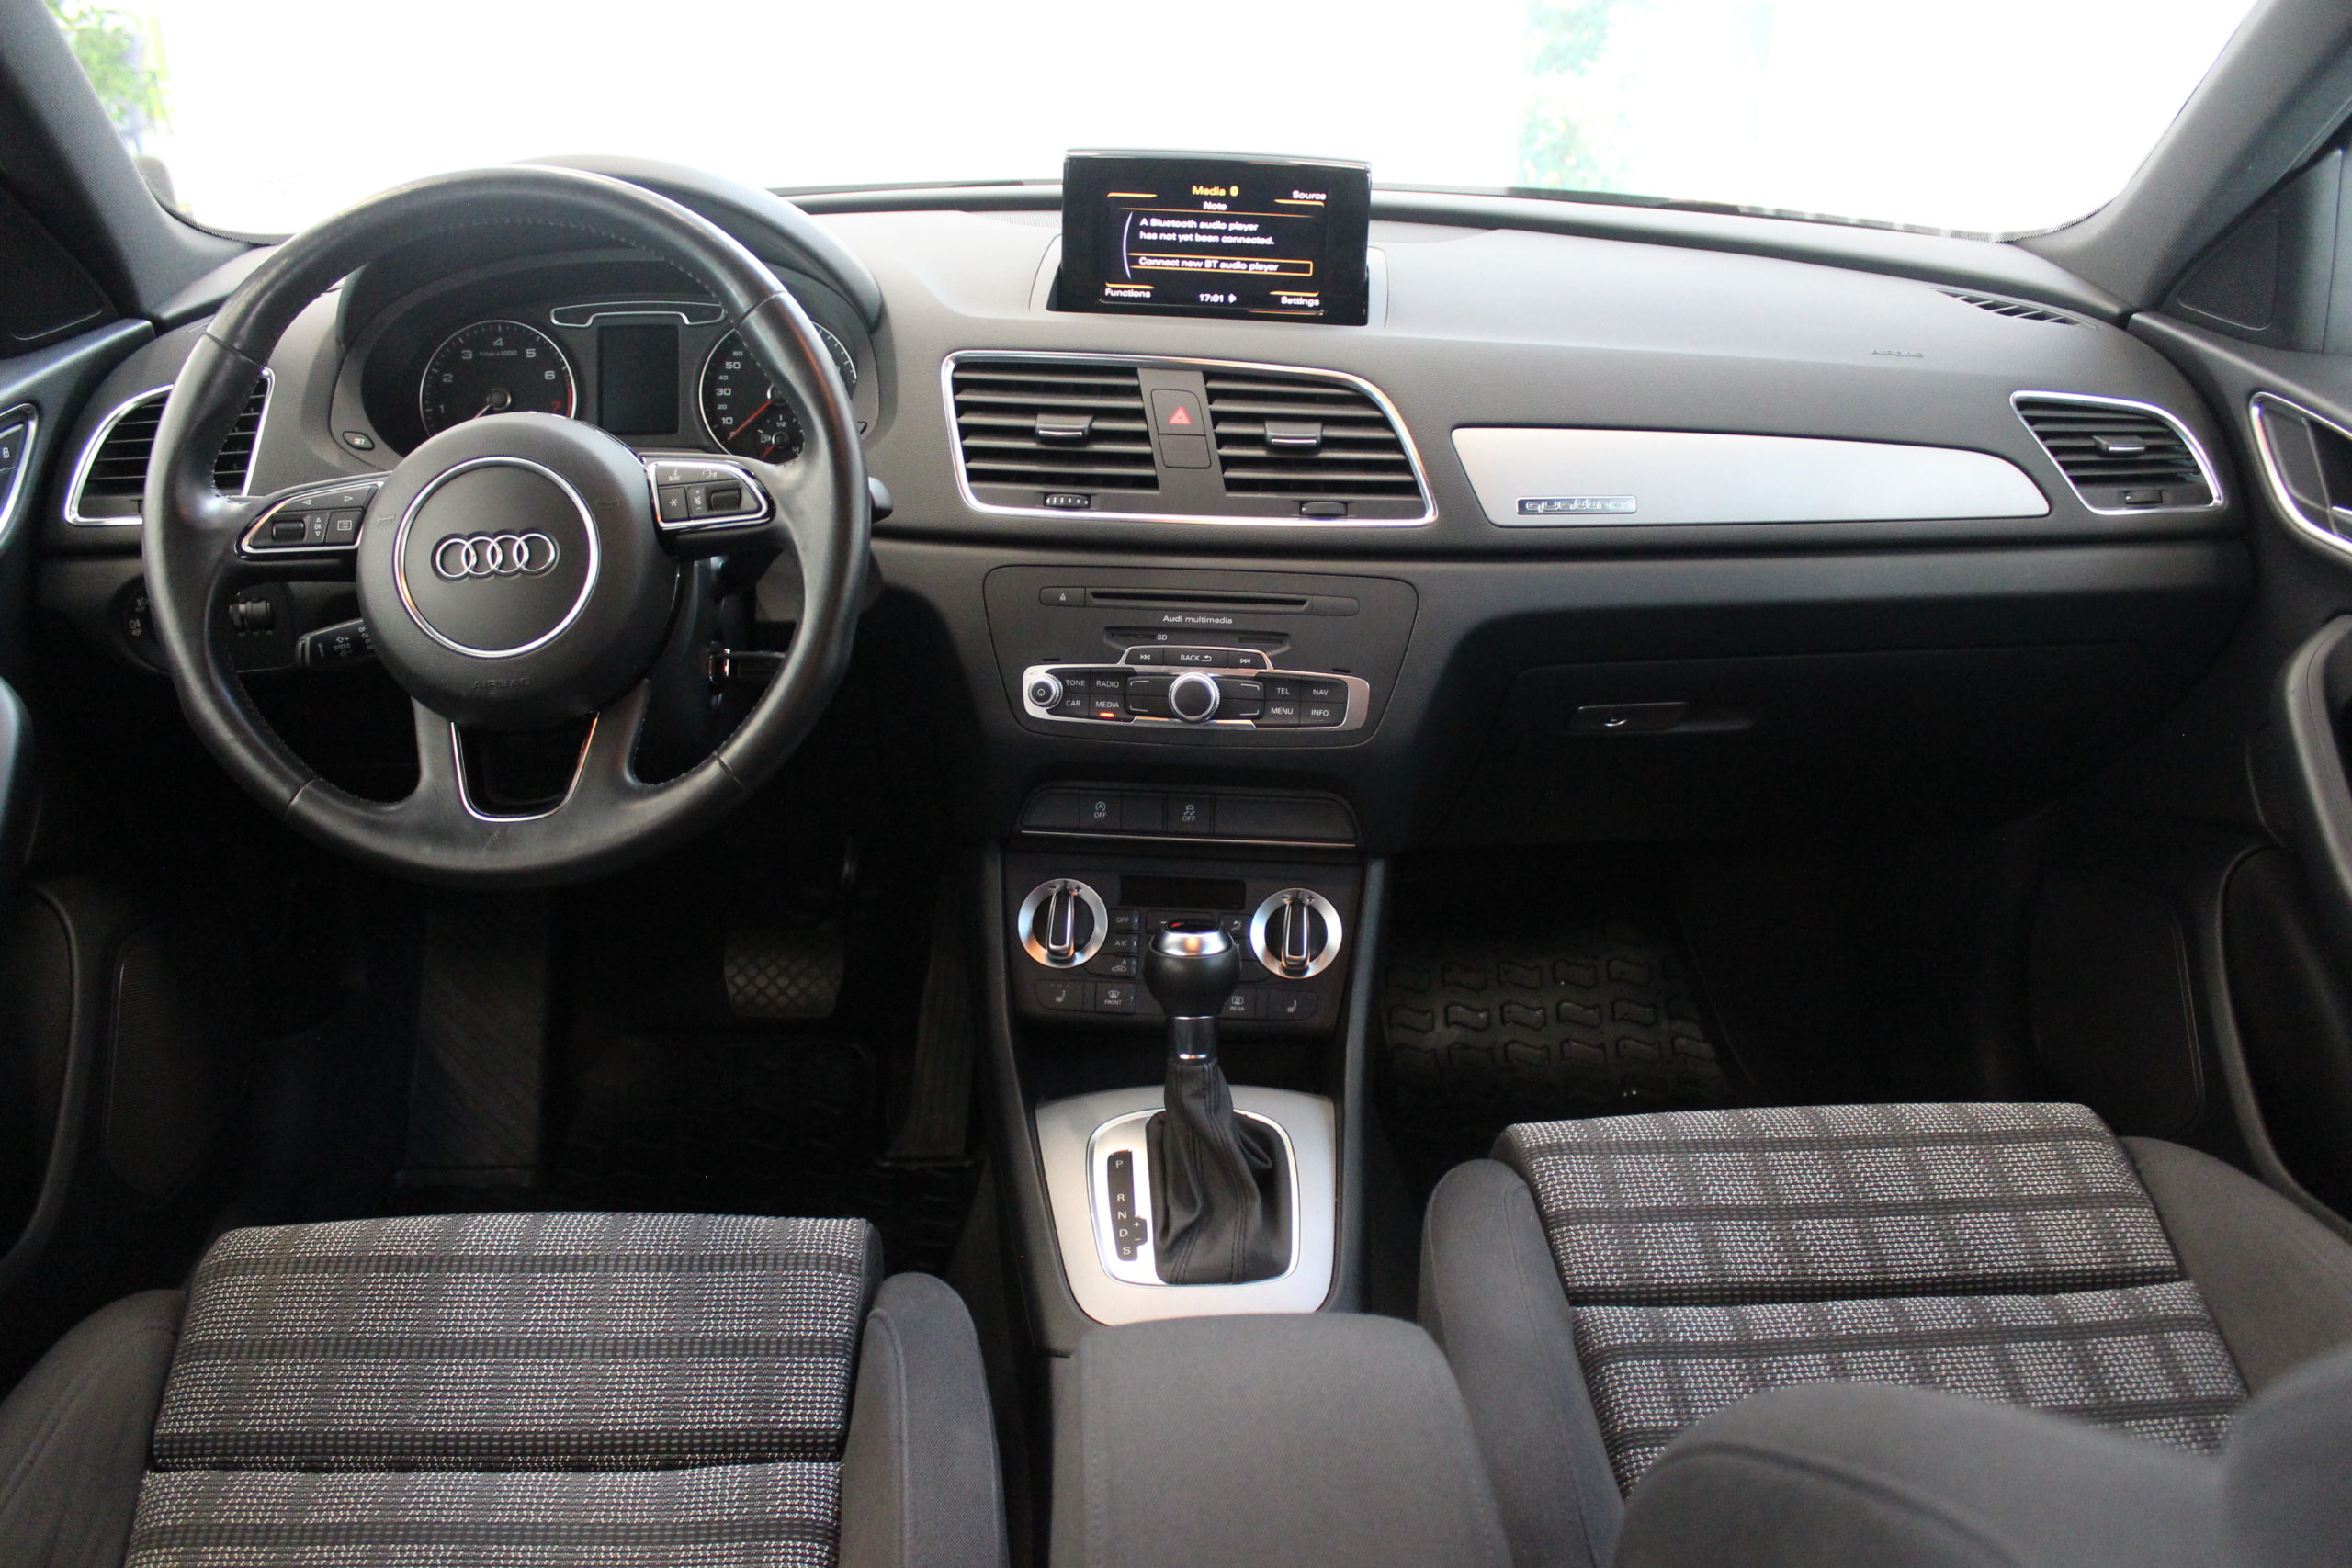 Audi Q3 2.0 TFSI quattro S Tronic Comfort 170hk